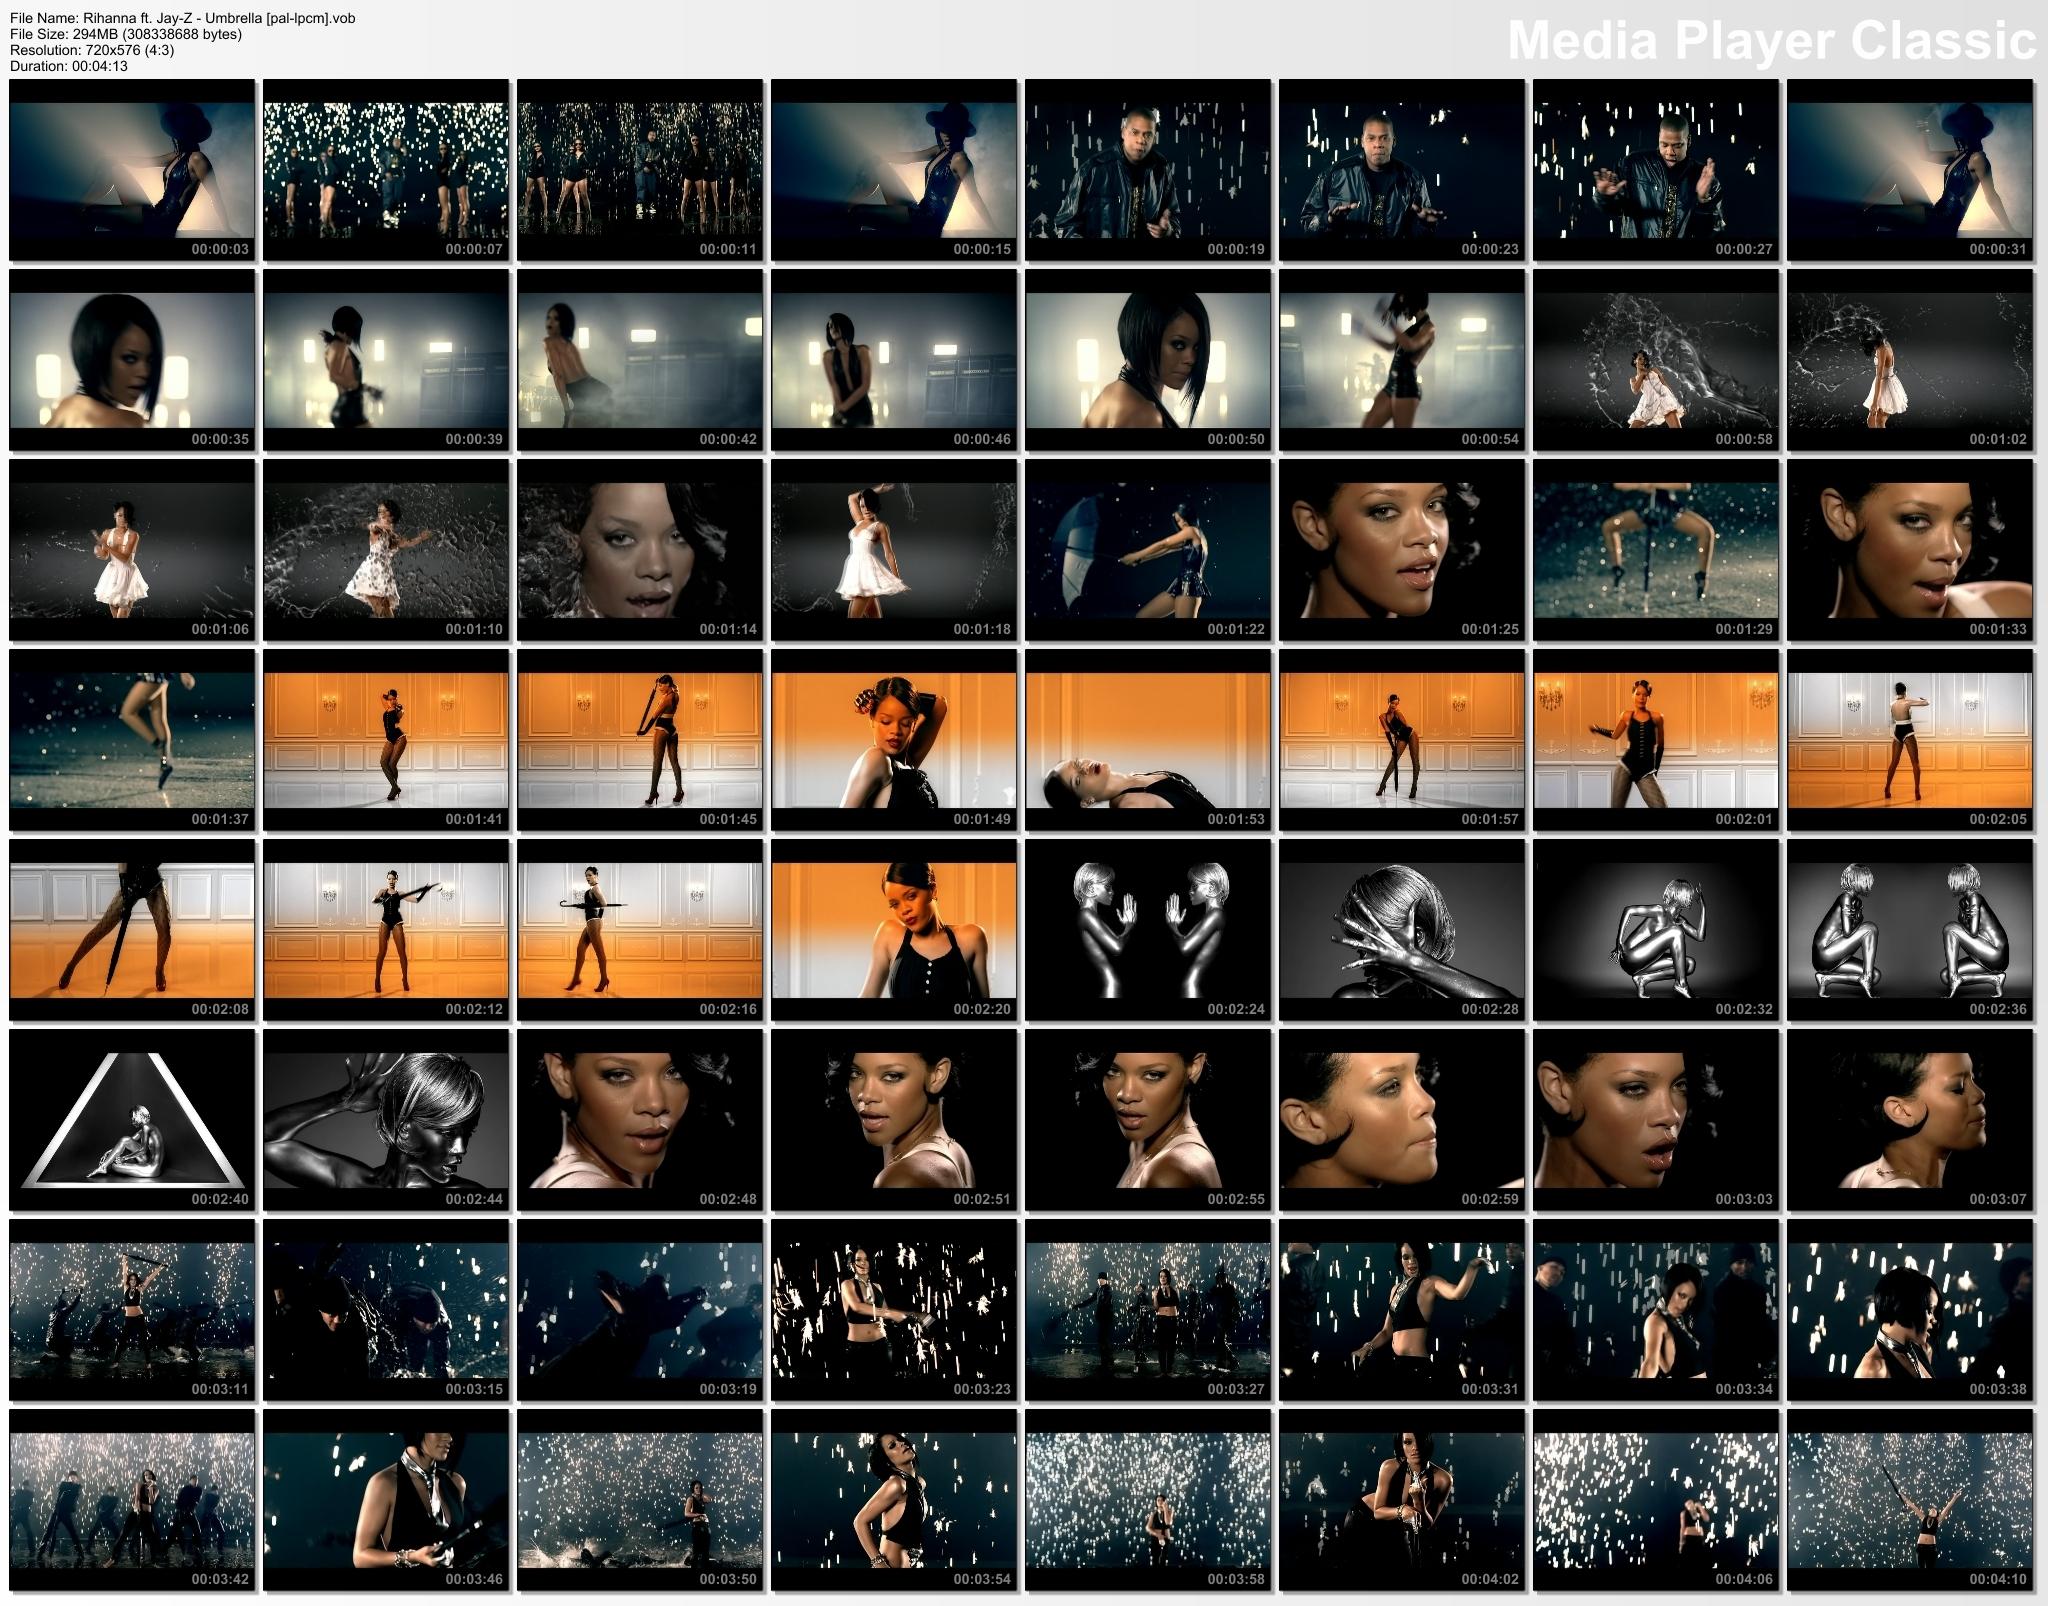 Rihanna - Umbrella HD - Download MP3 and MP4 for free